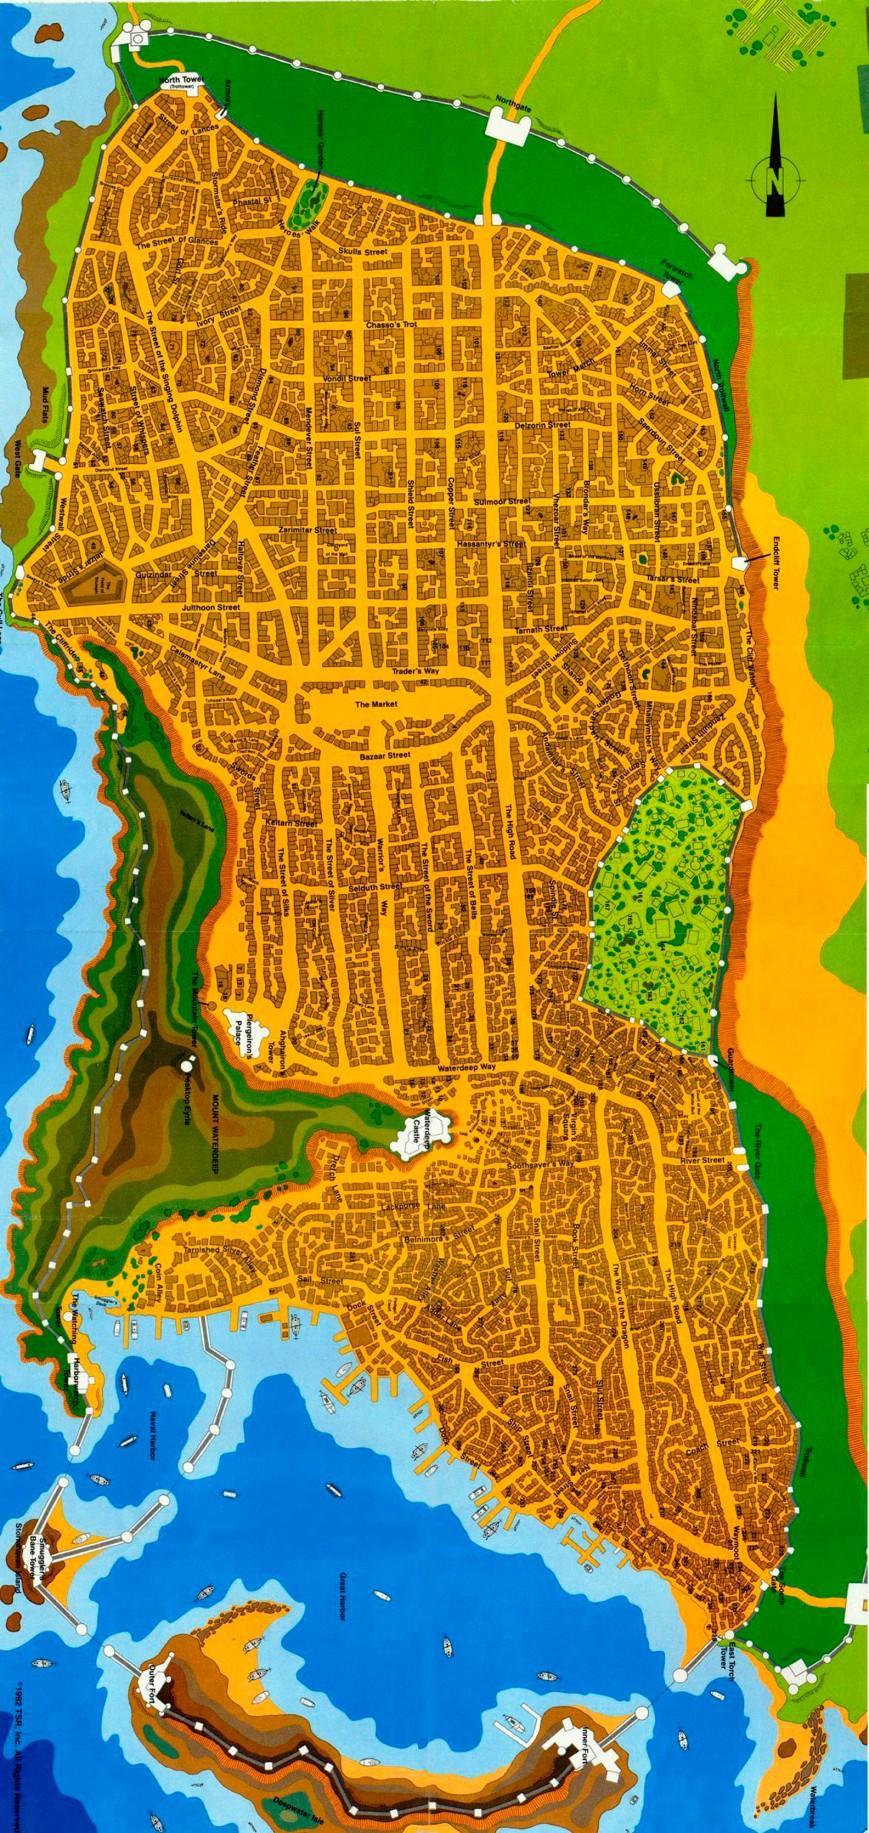 Waterdeep Map 1st editon